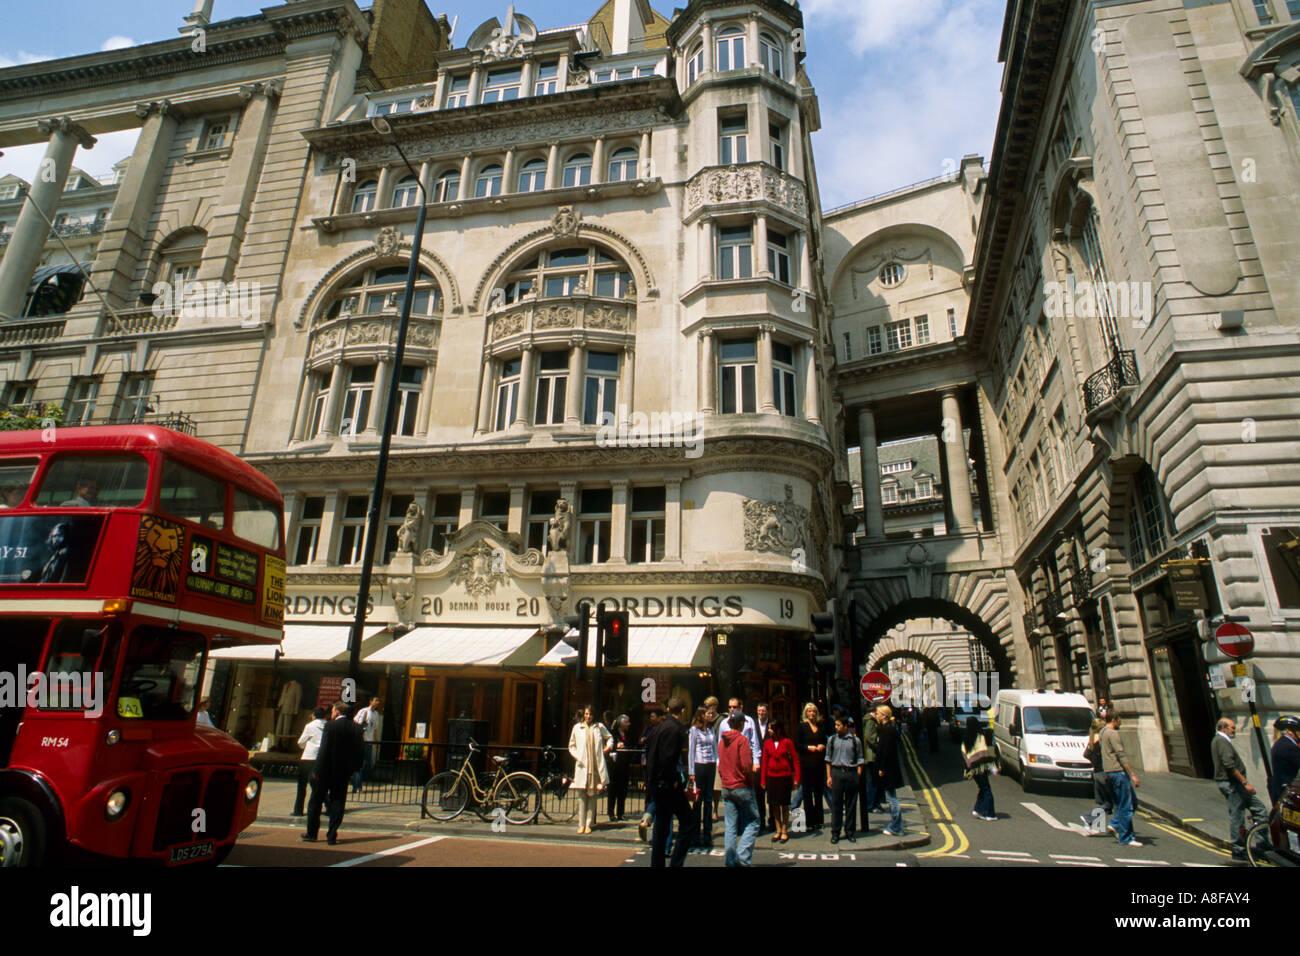 U K Britain England London Picadilly street scene - Stock Image